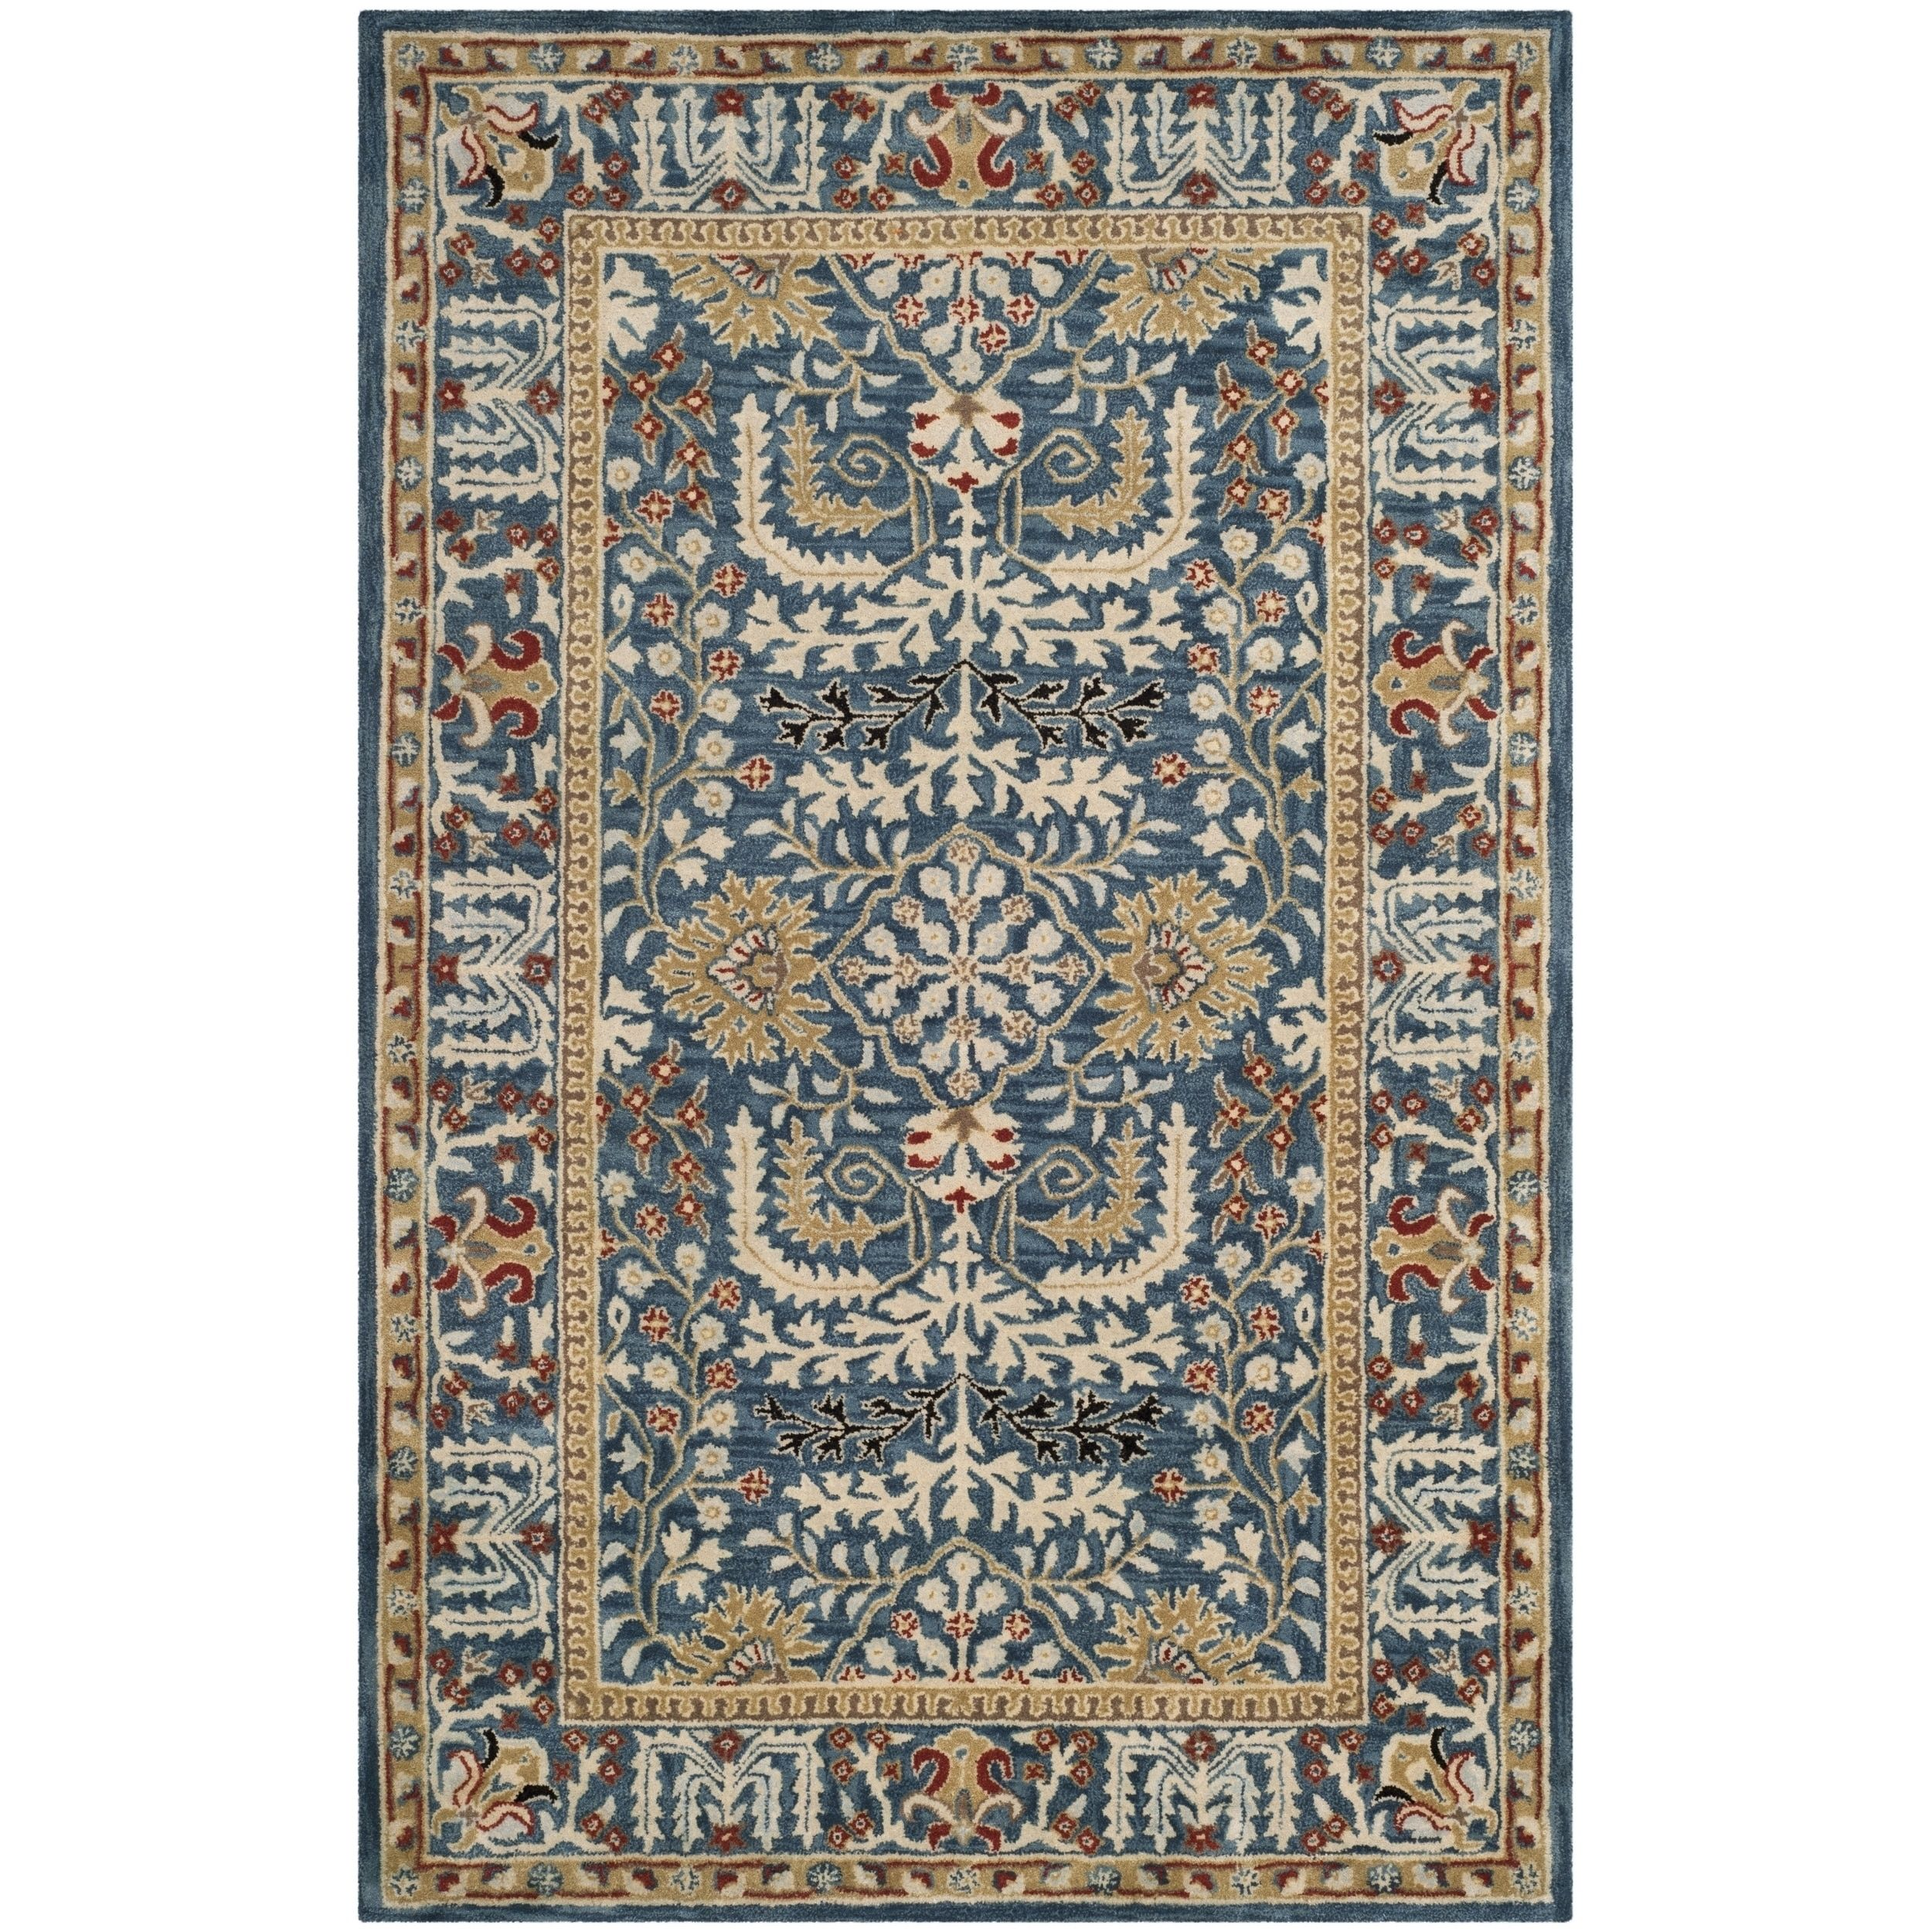 Safavieh Antiquity Traditional Handmade Dark Blue Multi Wool Rug 4 X 6